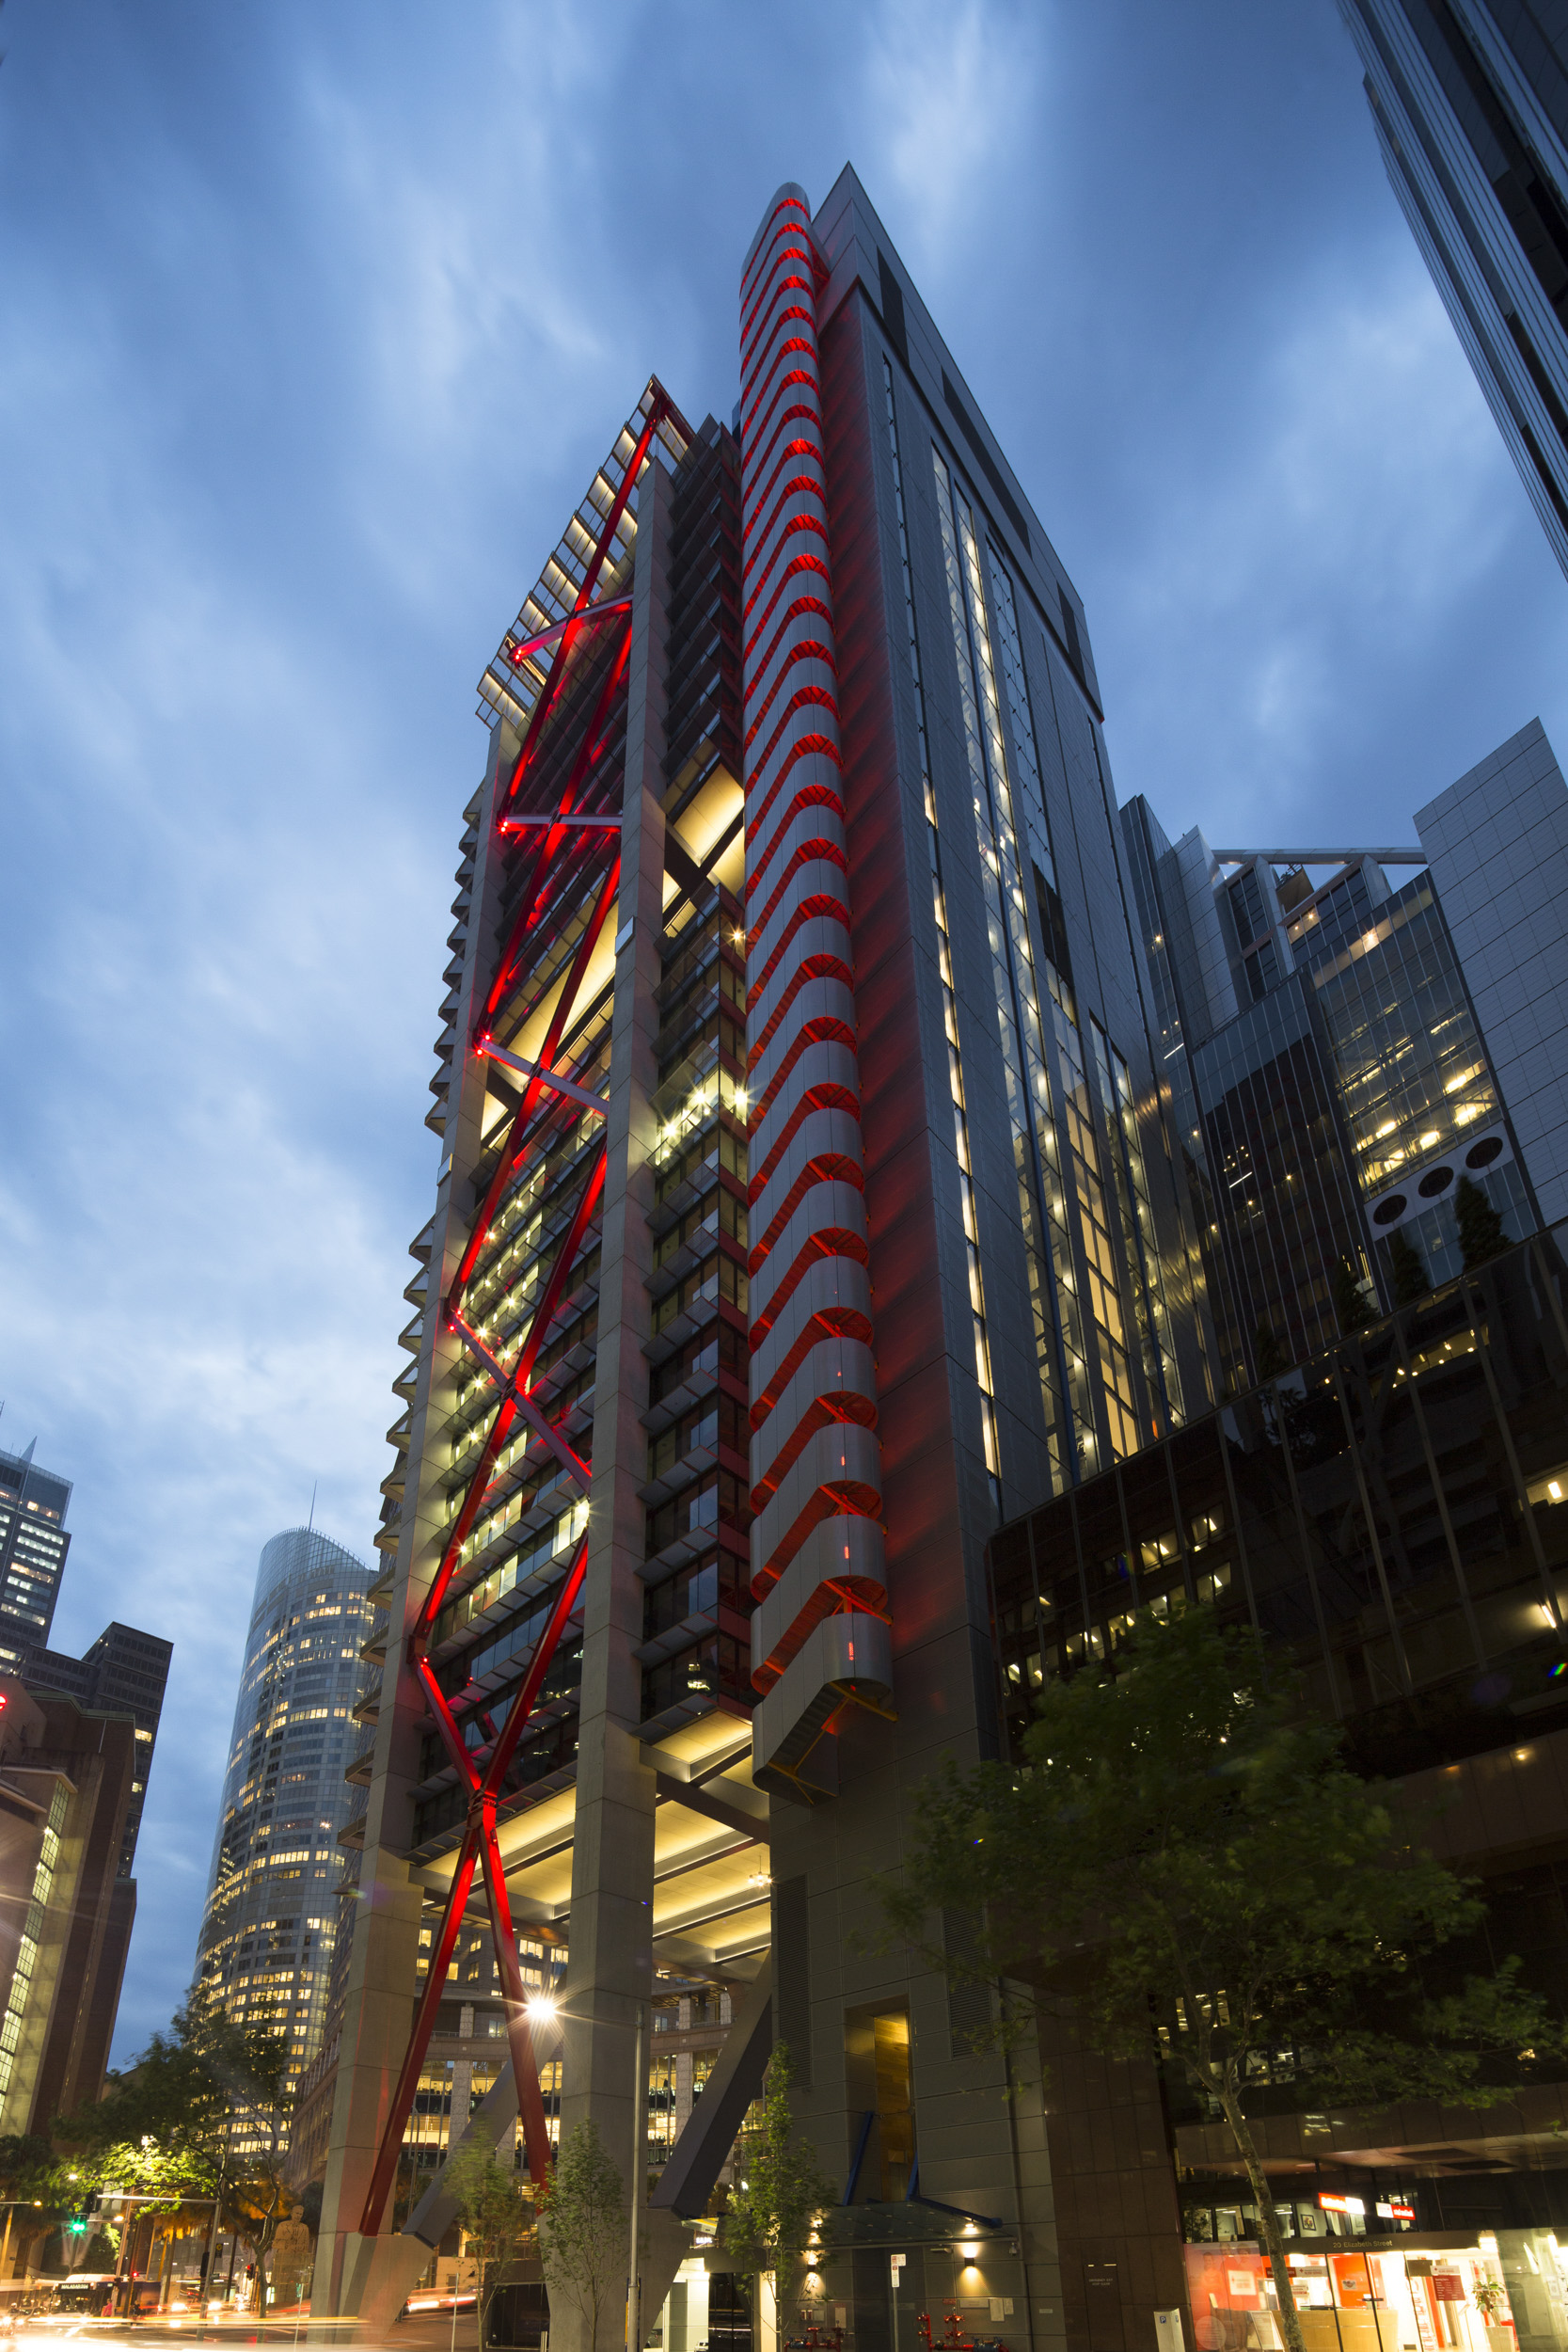 hirise_architecture_sydney_australia_10.jpg